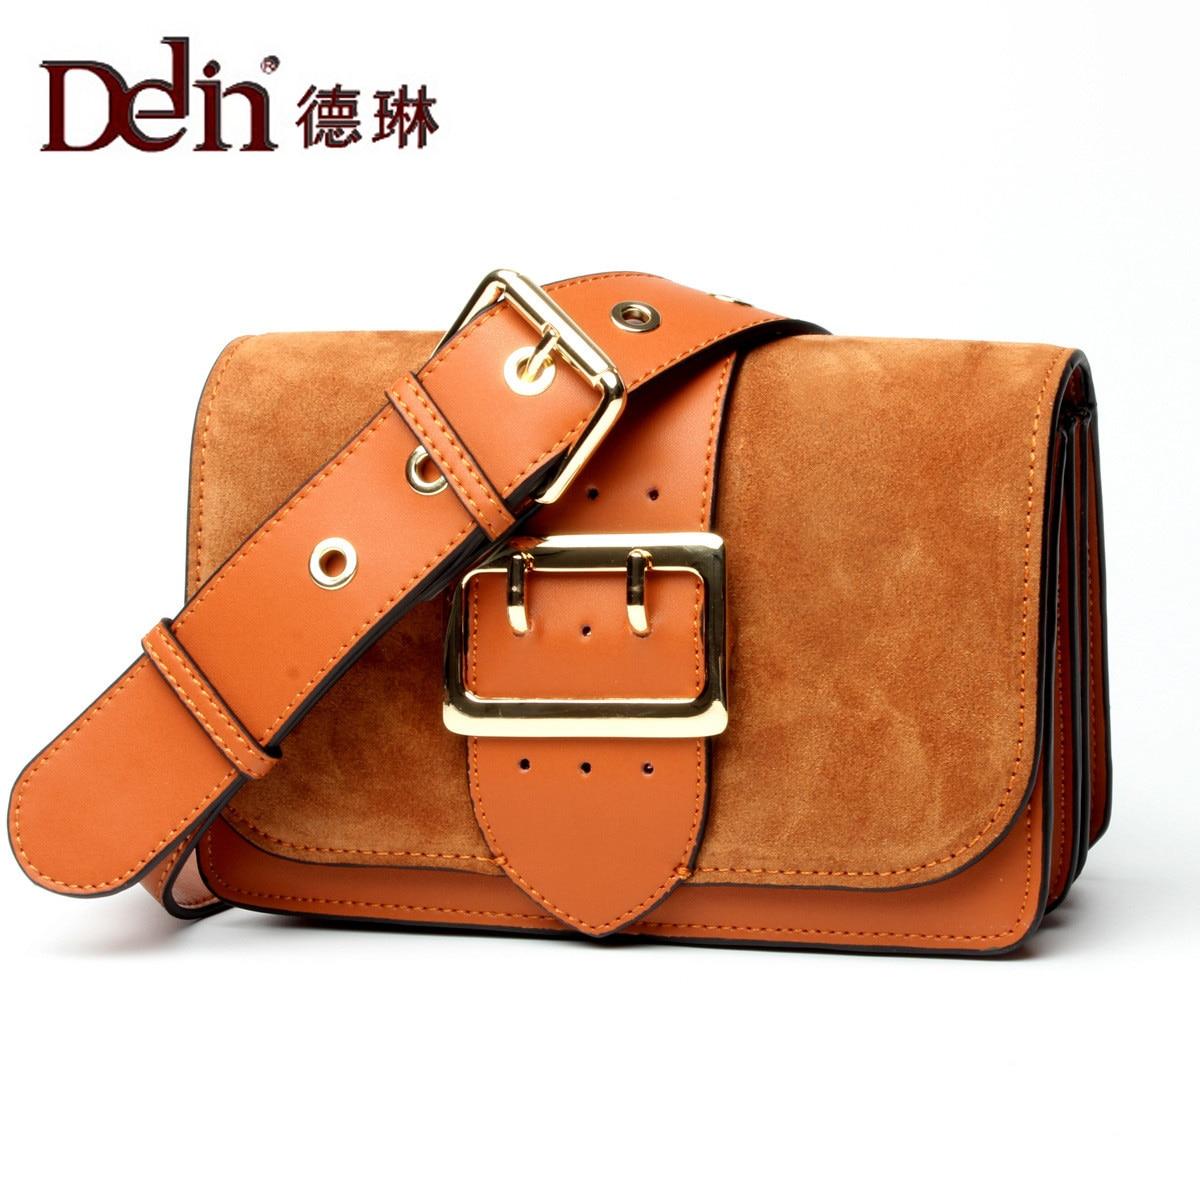 купить DELIN Female bag 2017 new tide leather handbag fashion leisure shoulder oblique cross bag  leather bag недорого